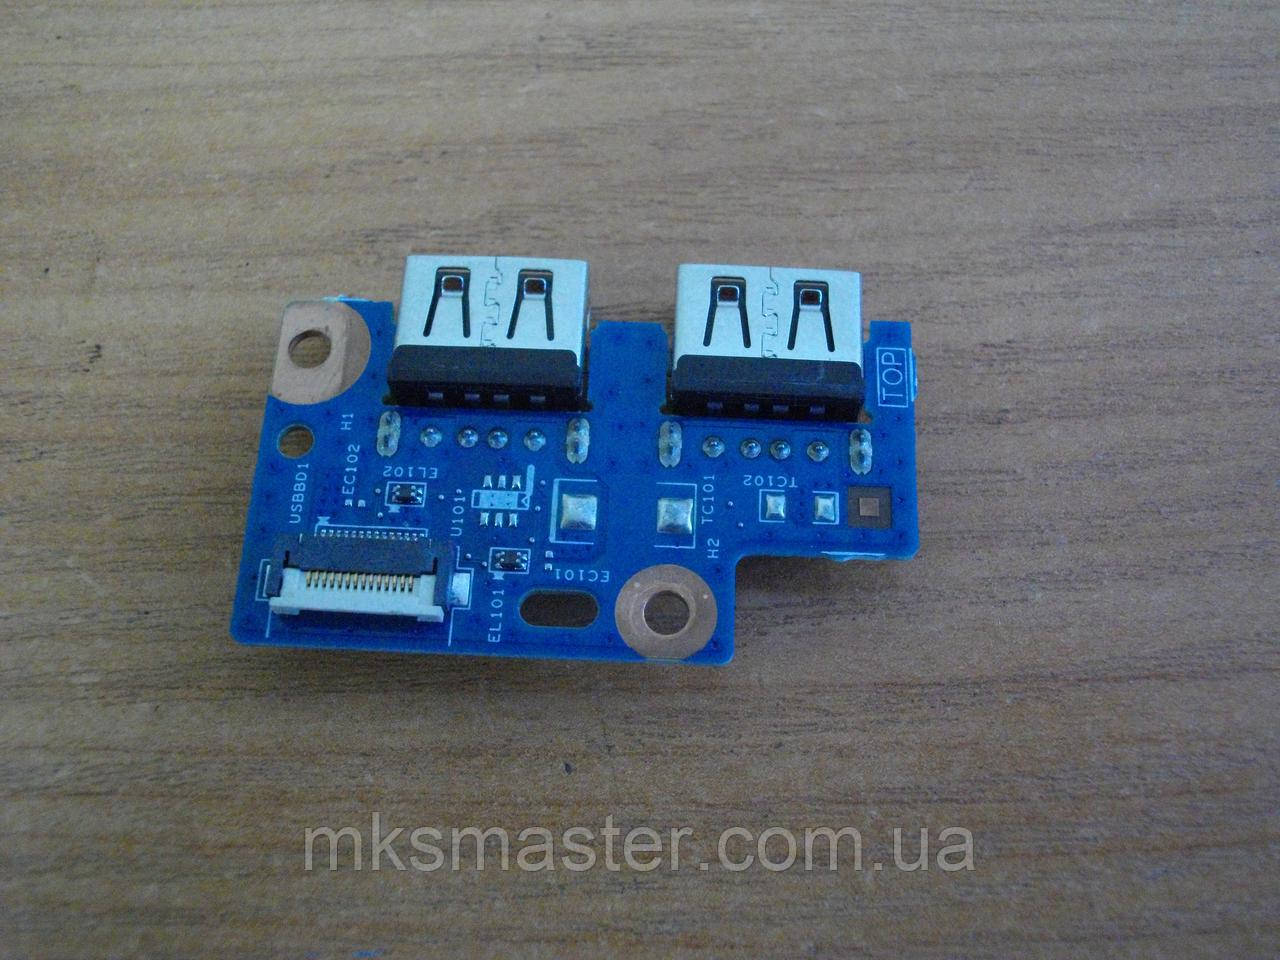 Плата з портами USB Gateway MS2370, NE522, NE52224u.